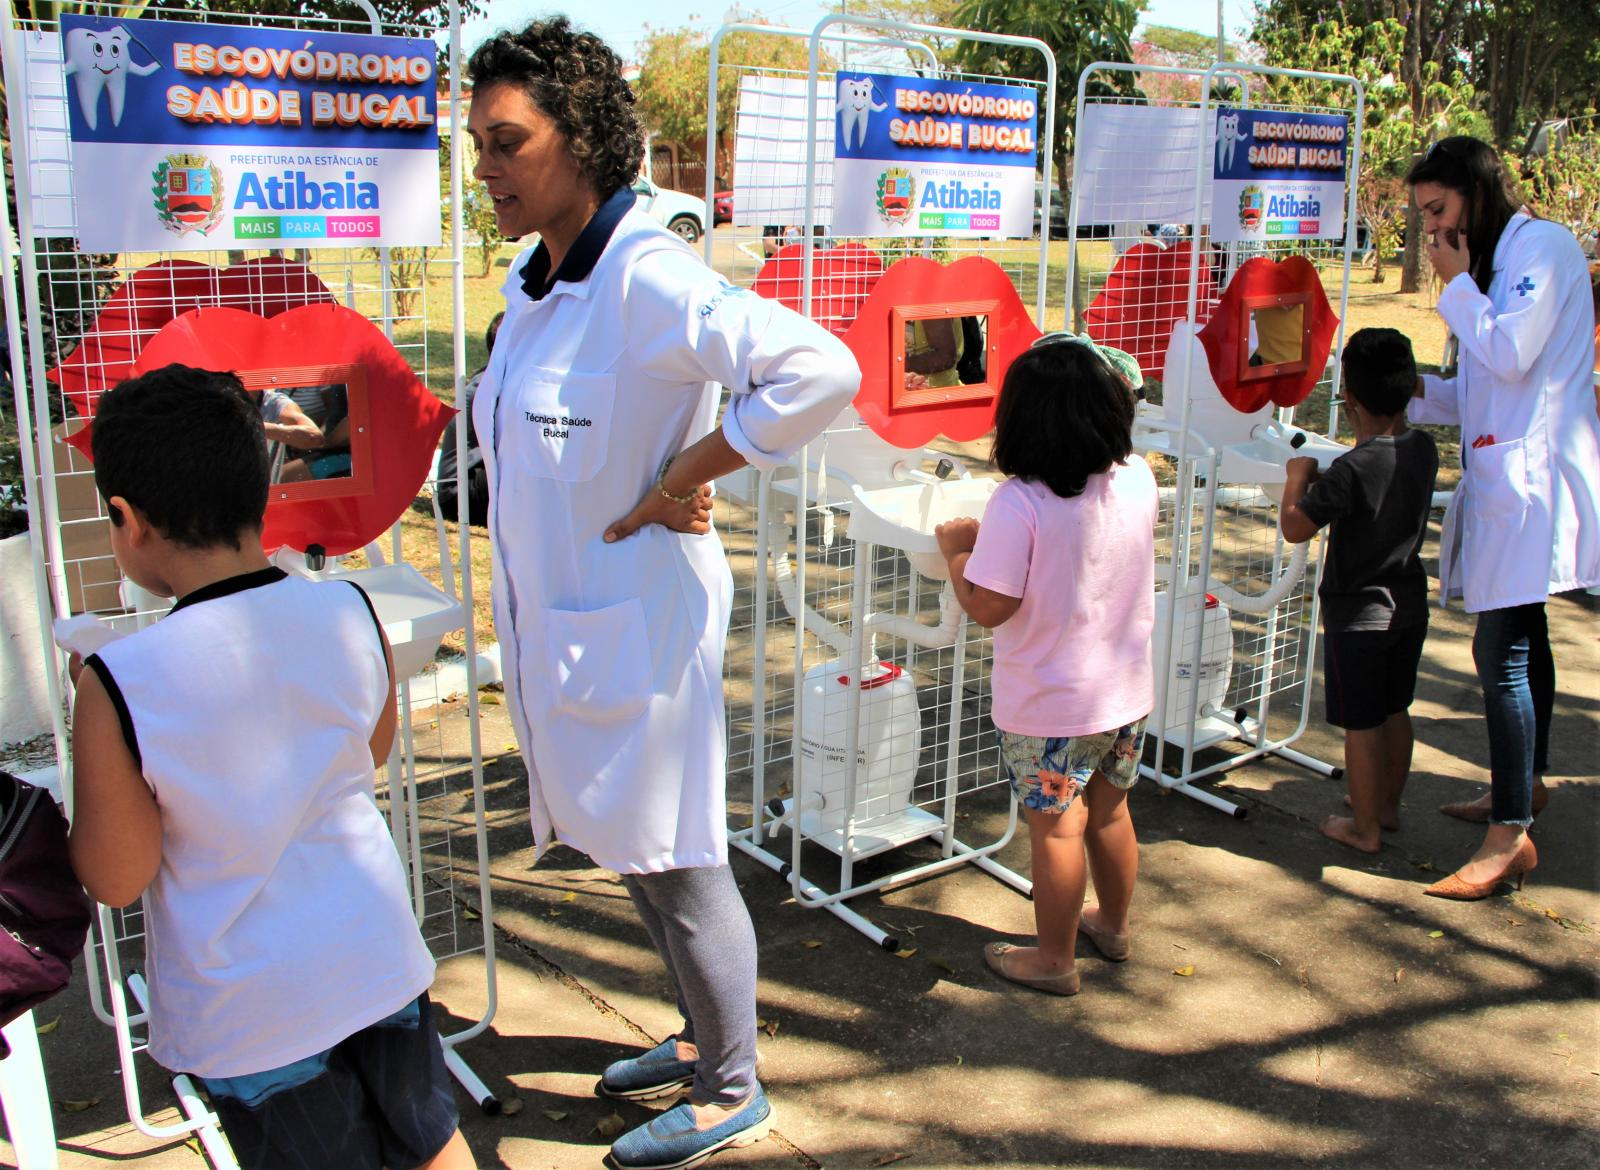 UNIFAAT Comunidade ultrapassou a marca de mil atendimentos gratuitos à comunidade